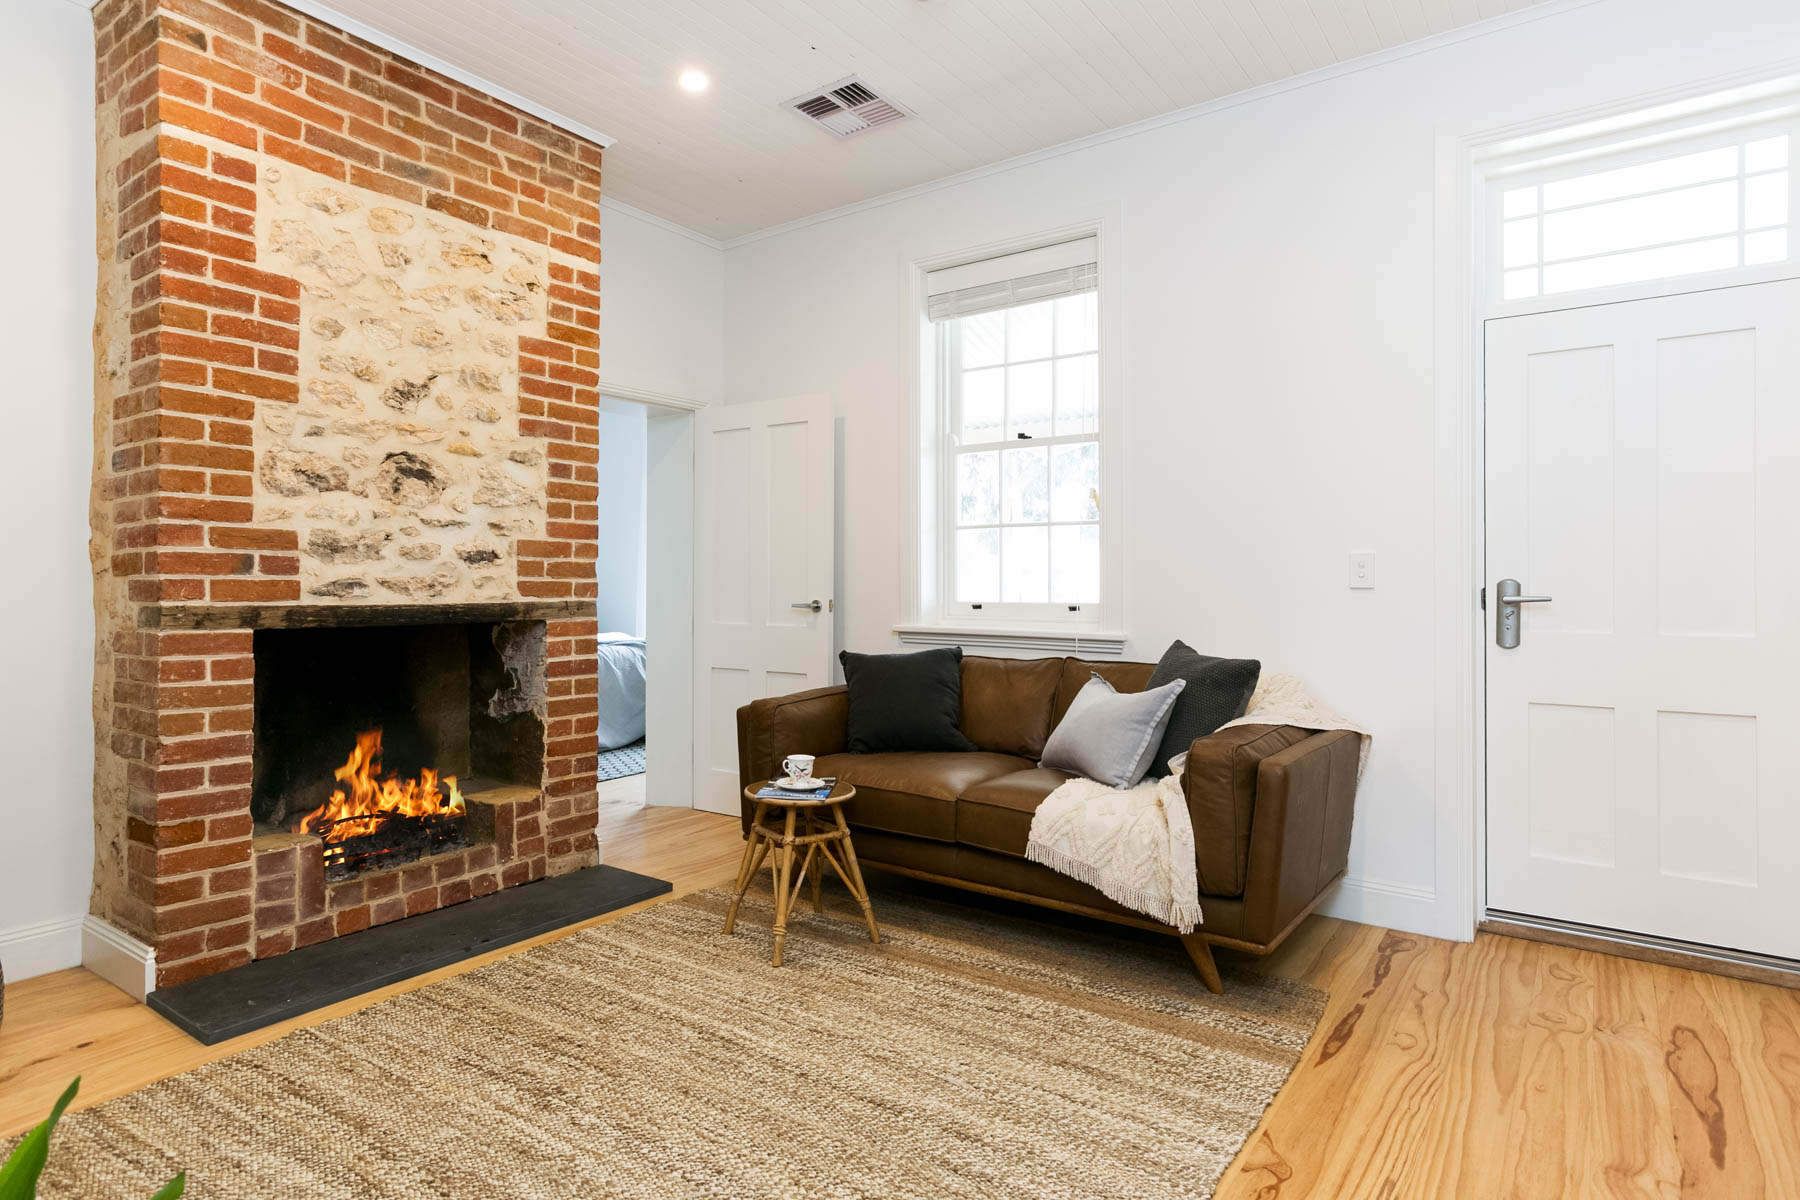 Renovation, Restoration, Extensions, Design, Builders, Goolwa, Fleurieu, Cottage, Award Winning, Living Area, Fireplace, Wood Fire